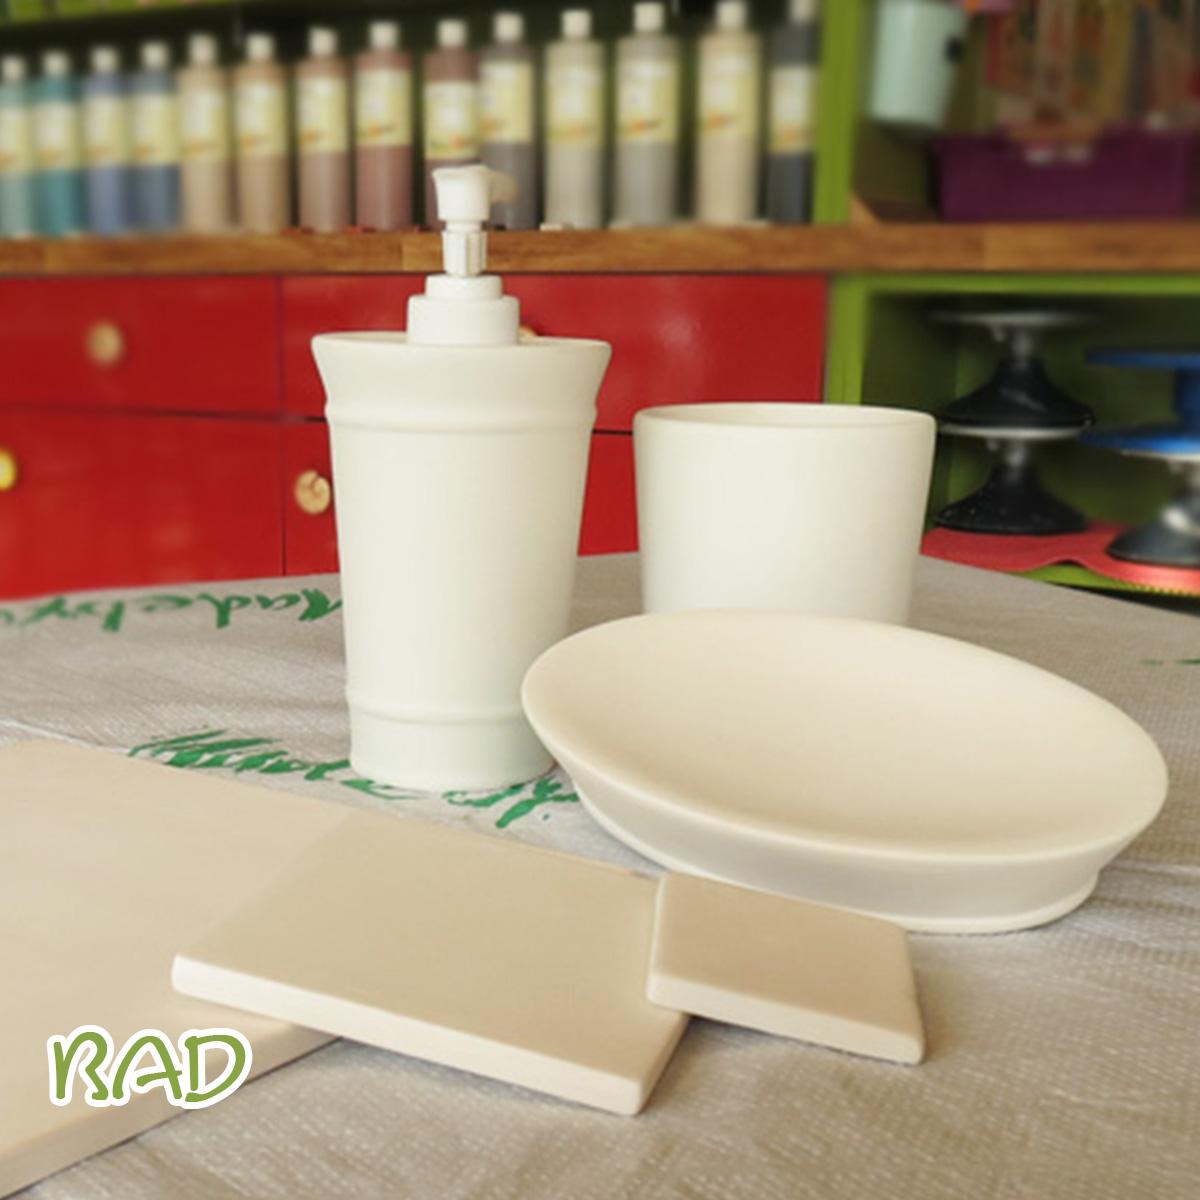 Keramik zum bemalen fürs Bad